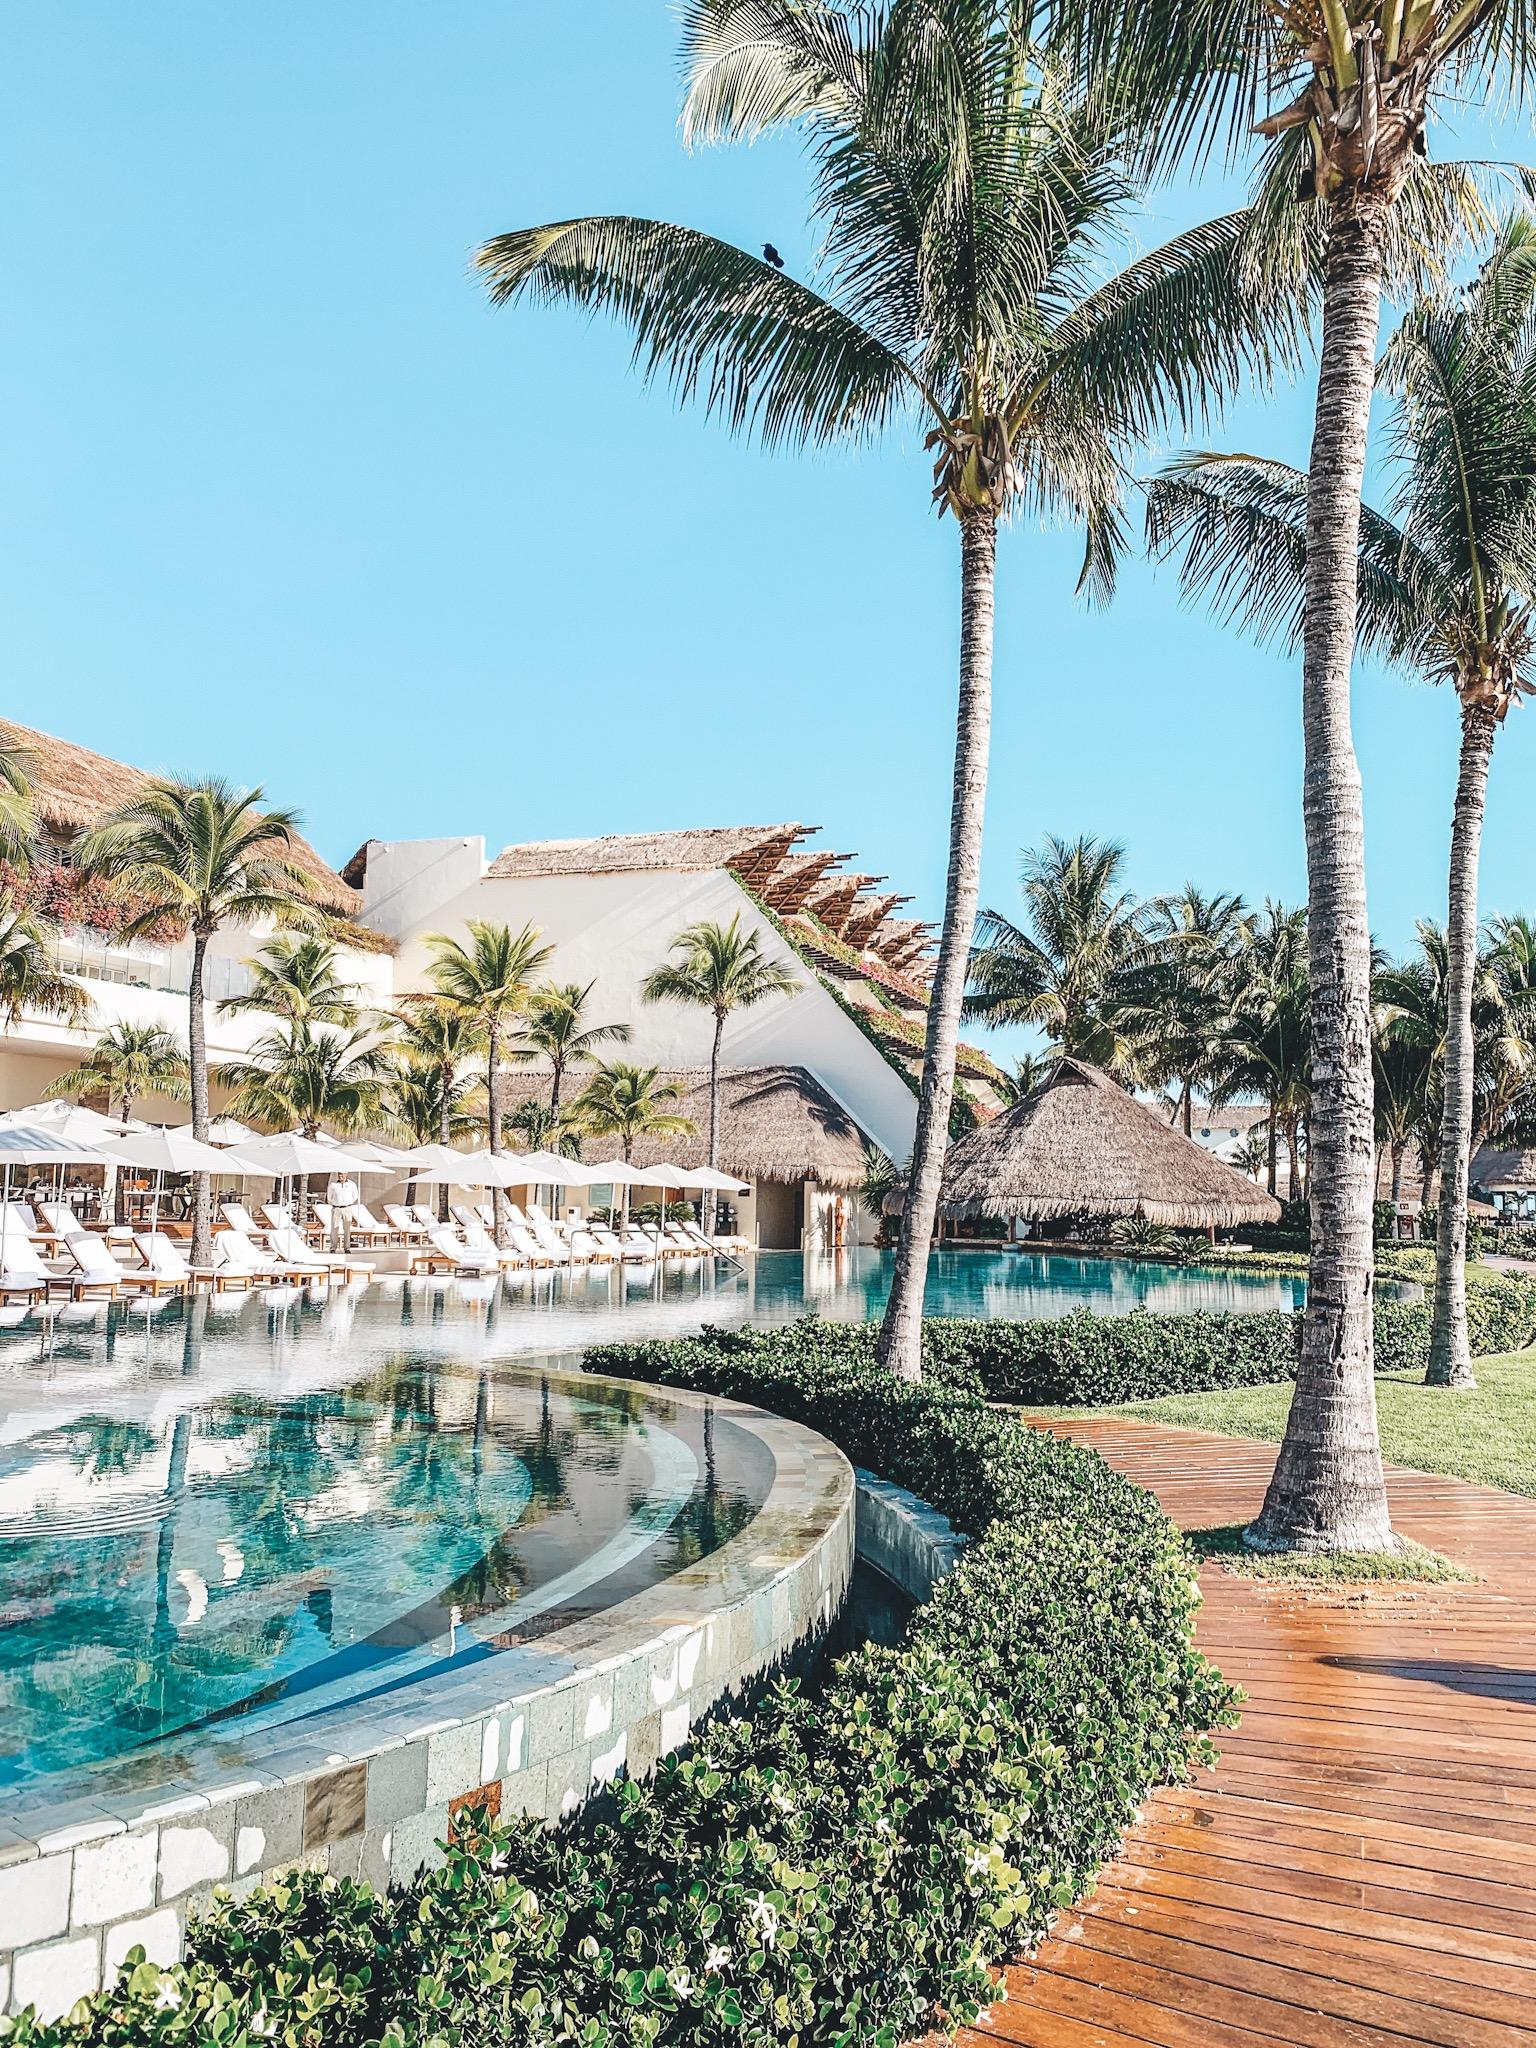 Grand Class at the Grand Velas Riviera Maya Luxury All-Inclusive